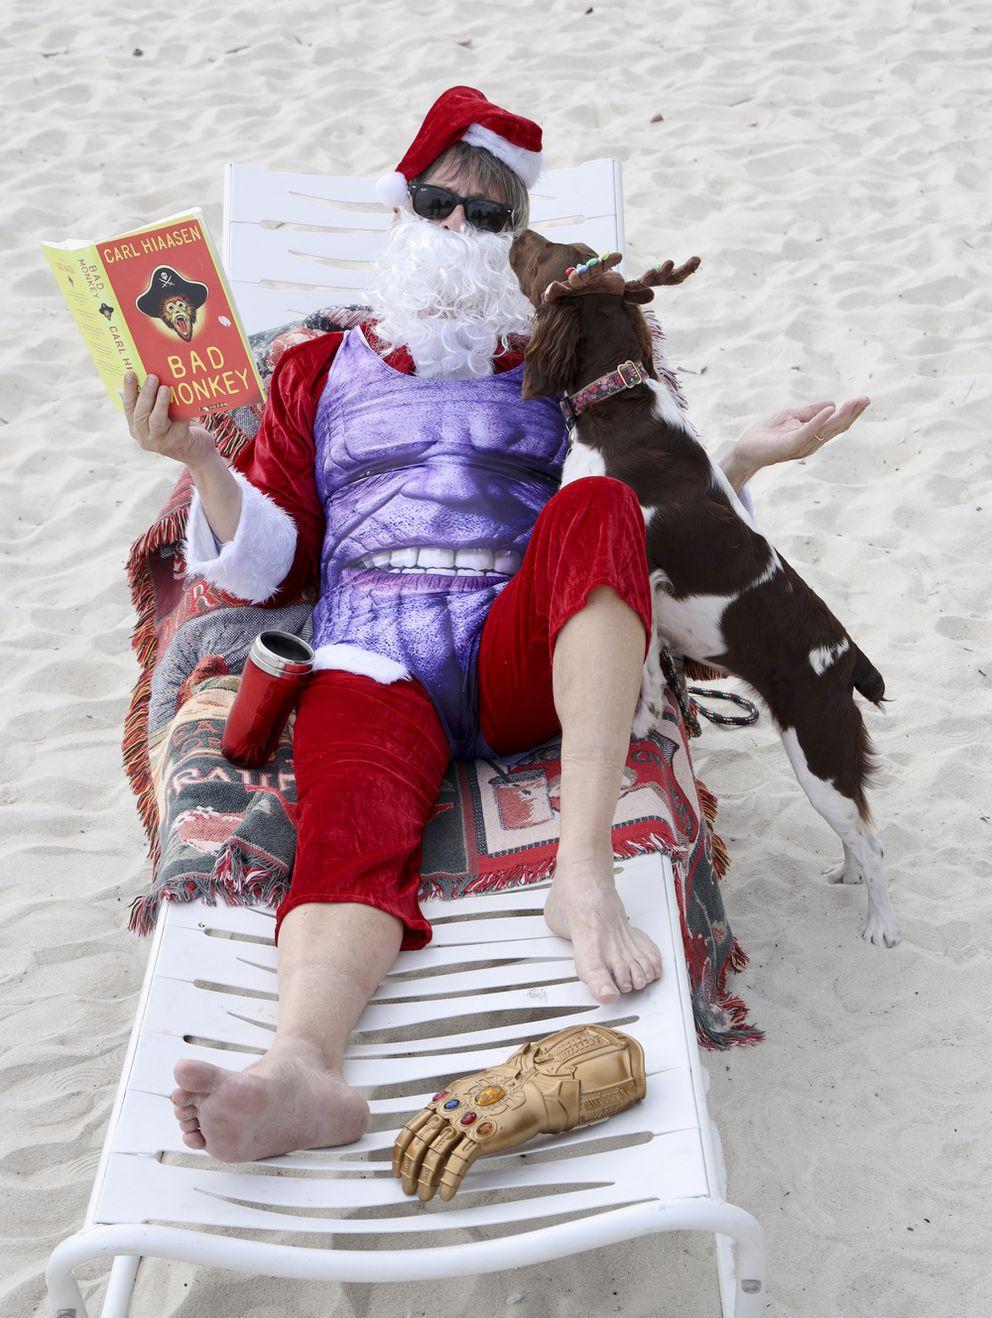 Thanos Swimsuit (Carle Juste/Miami Herald/TNS)